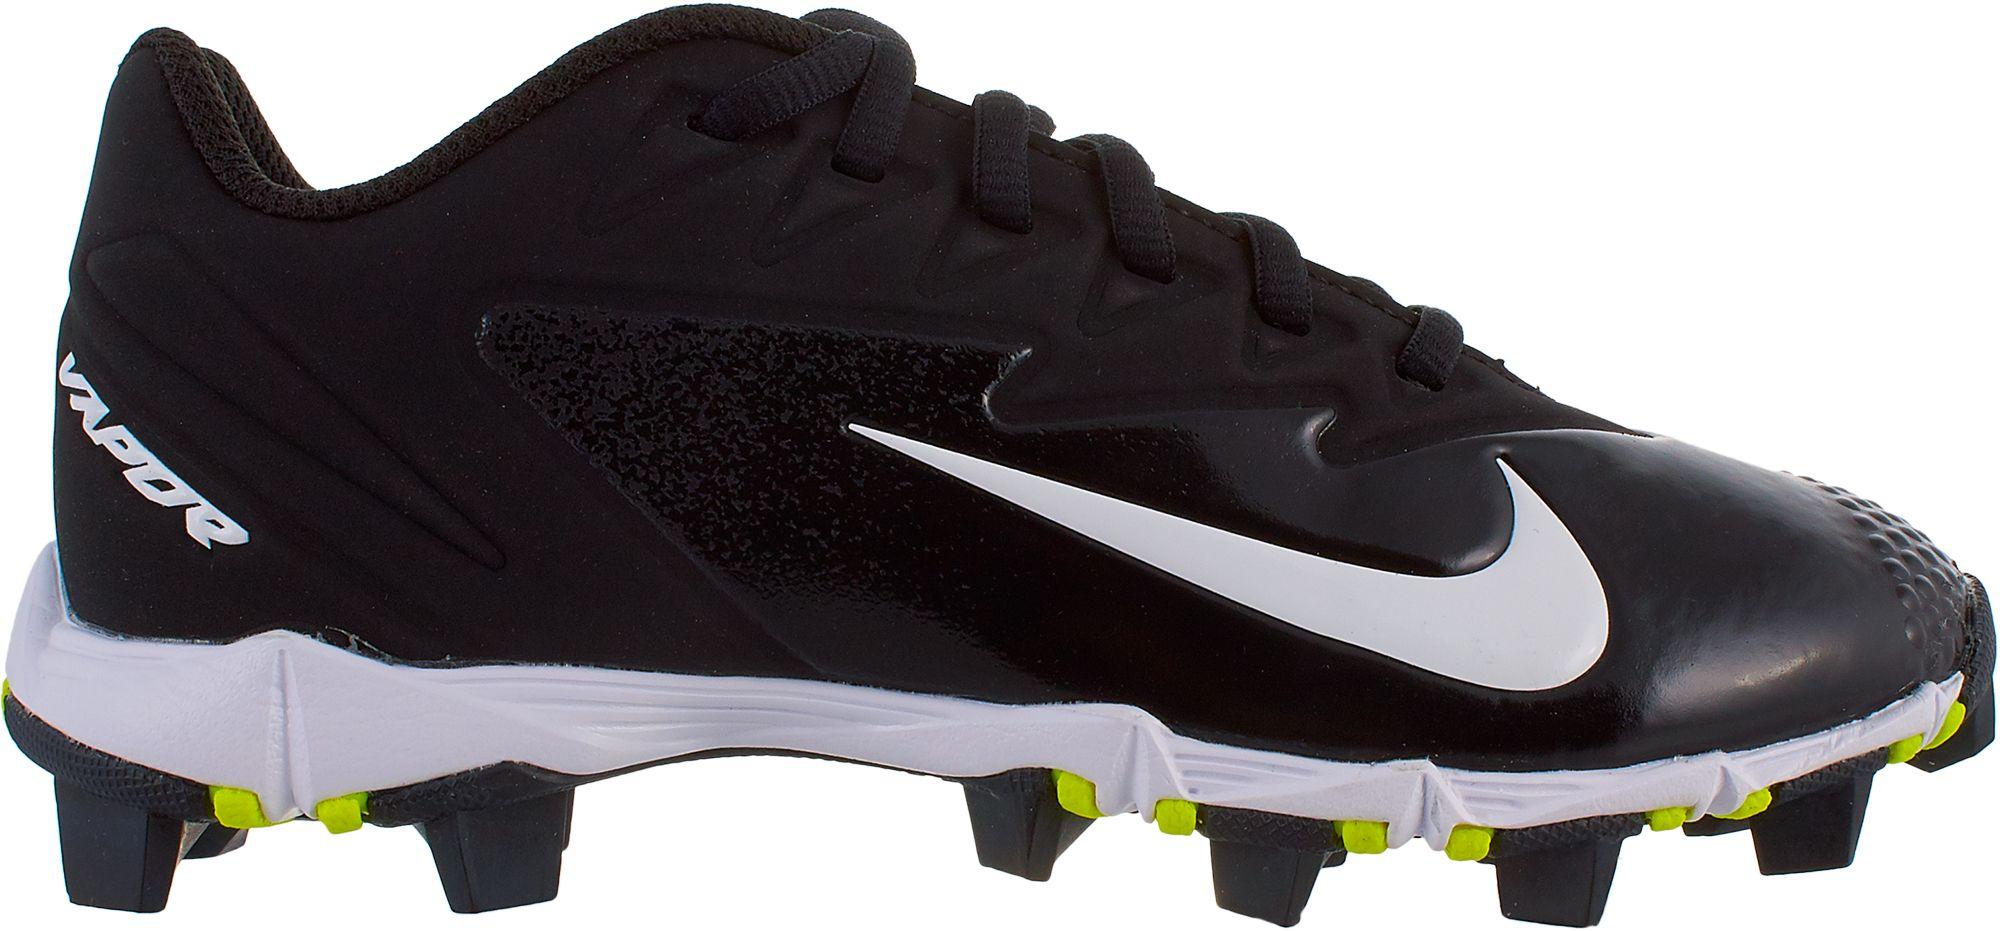 4f261cdce high-quality Nike Kids Vapor Ultrafly Keystone Baseball Cleats DICKS  Sporting Goods